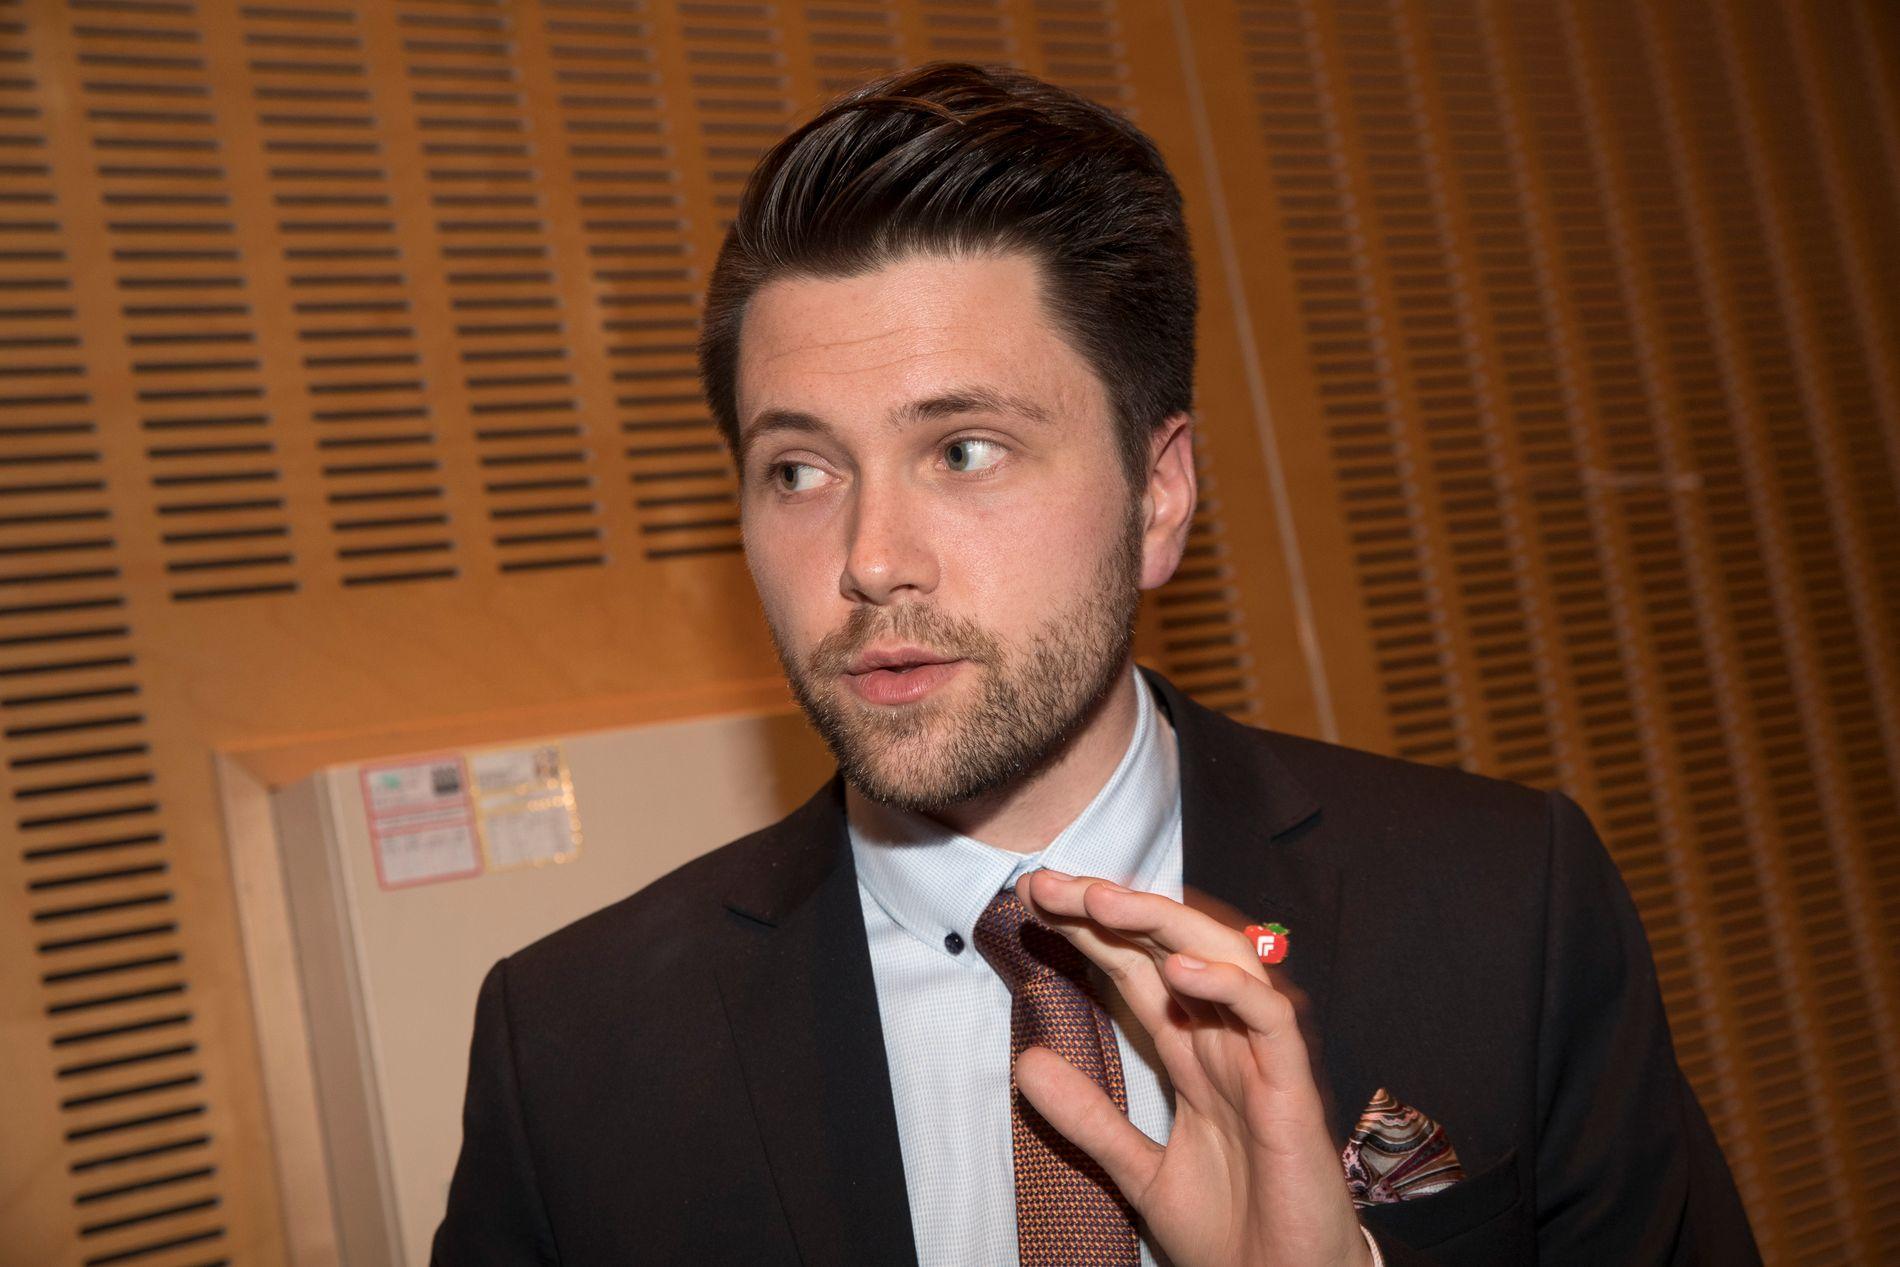 FPU-LEDER:  Bjørn-Kristian Svendsrud.